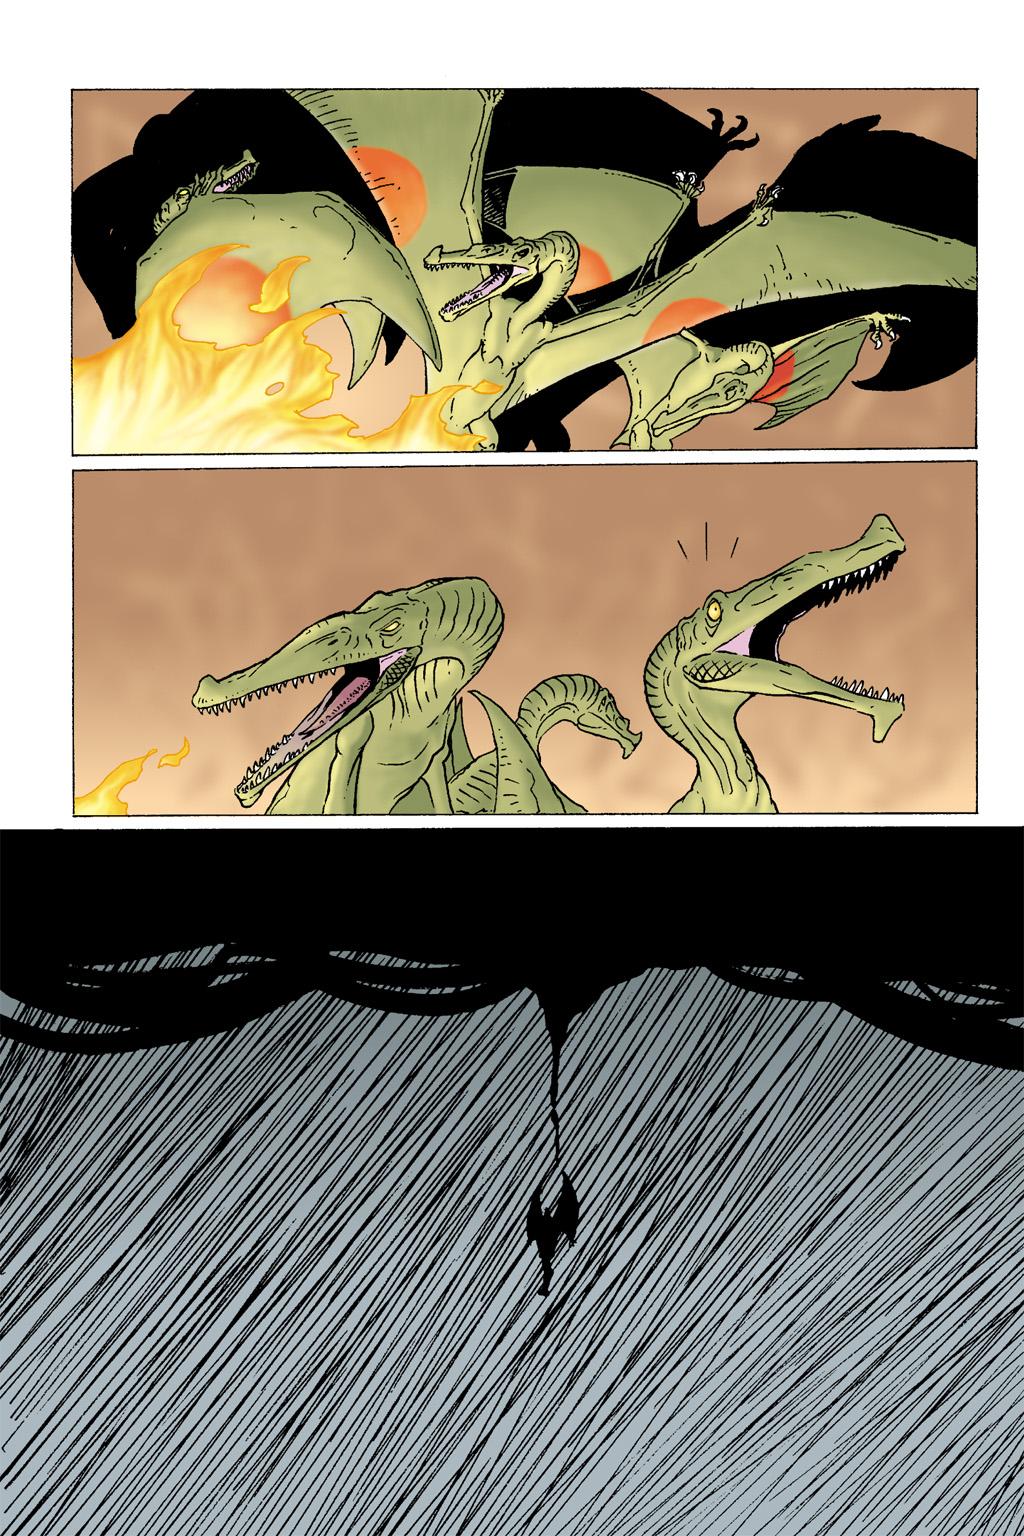 Age of Reptiles Omnibus Chap 7 - Next Chap 8